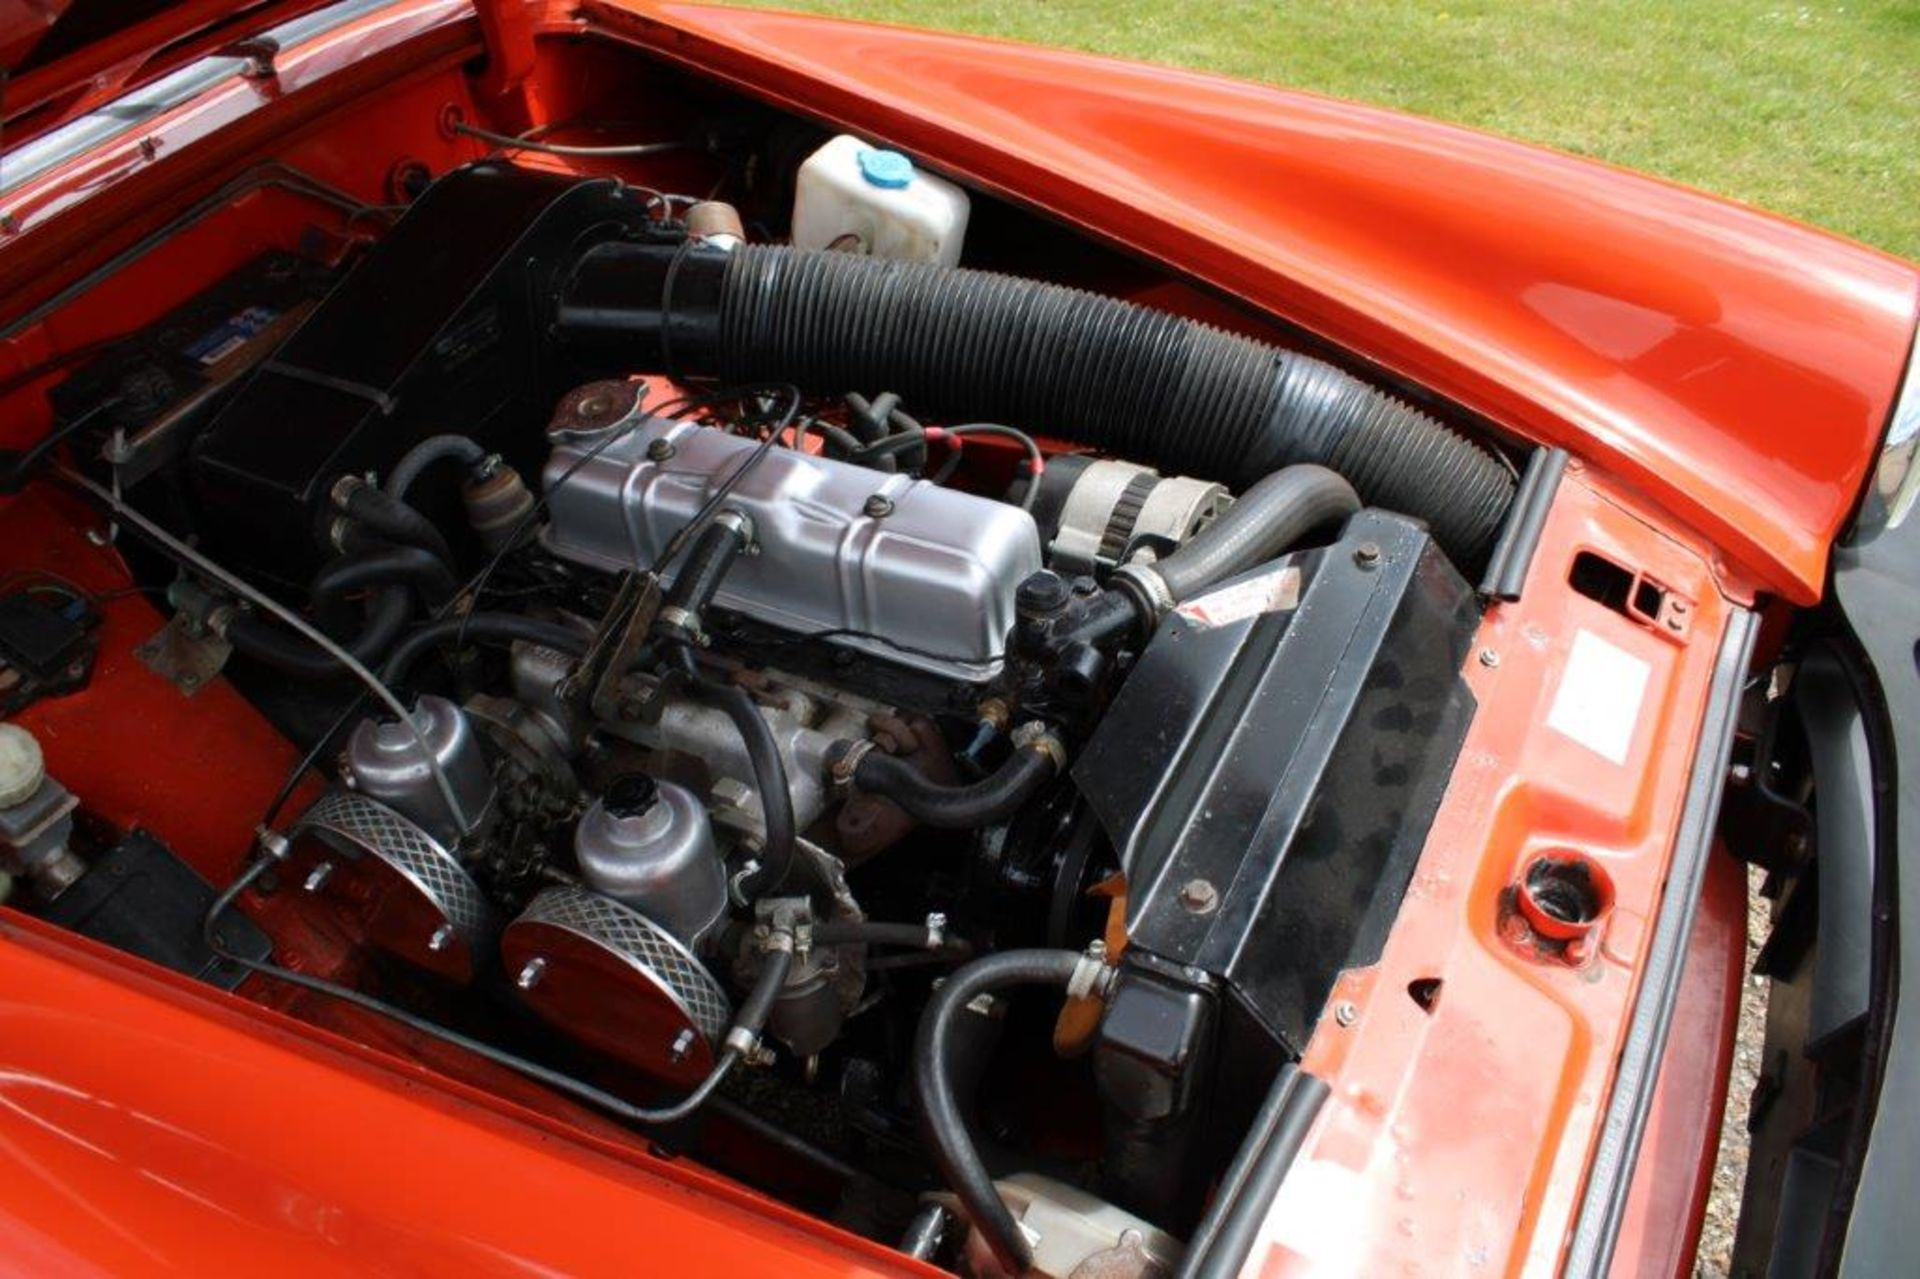 1979 MG Midget 1500 - Image 26 of 37